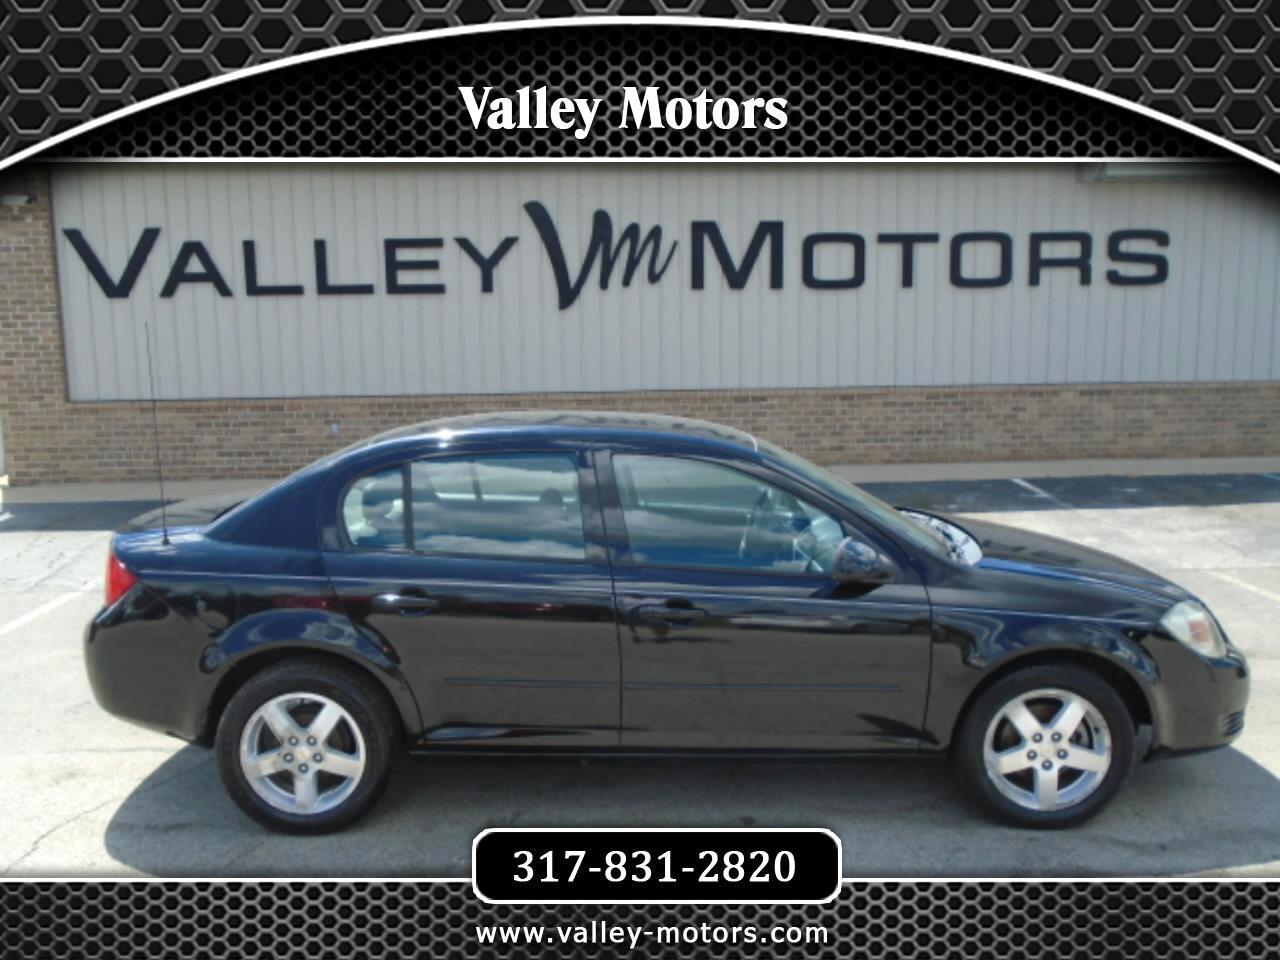 Chevrolet Cobalt 4dr Sdn LT w/2LT 2010